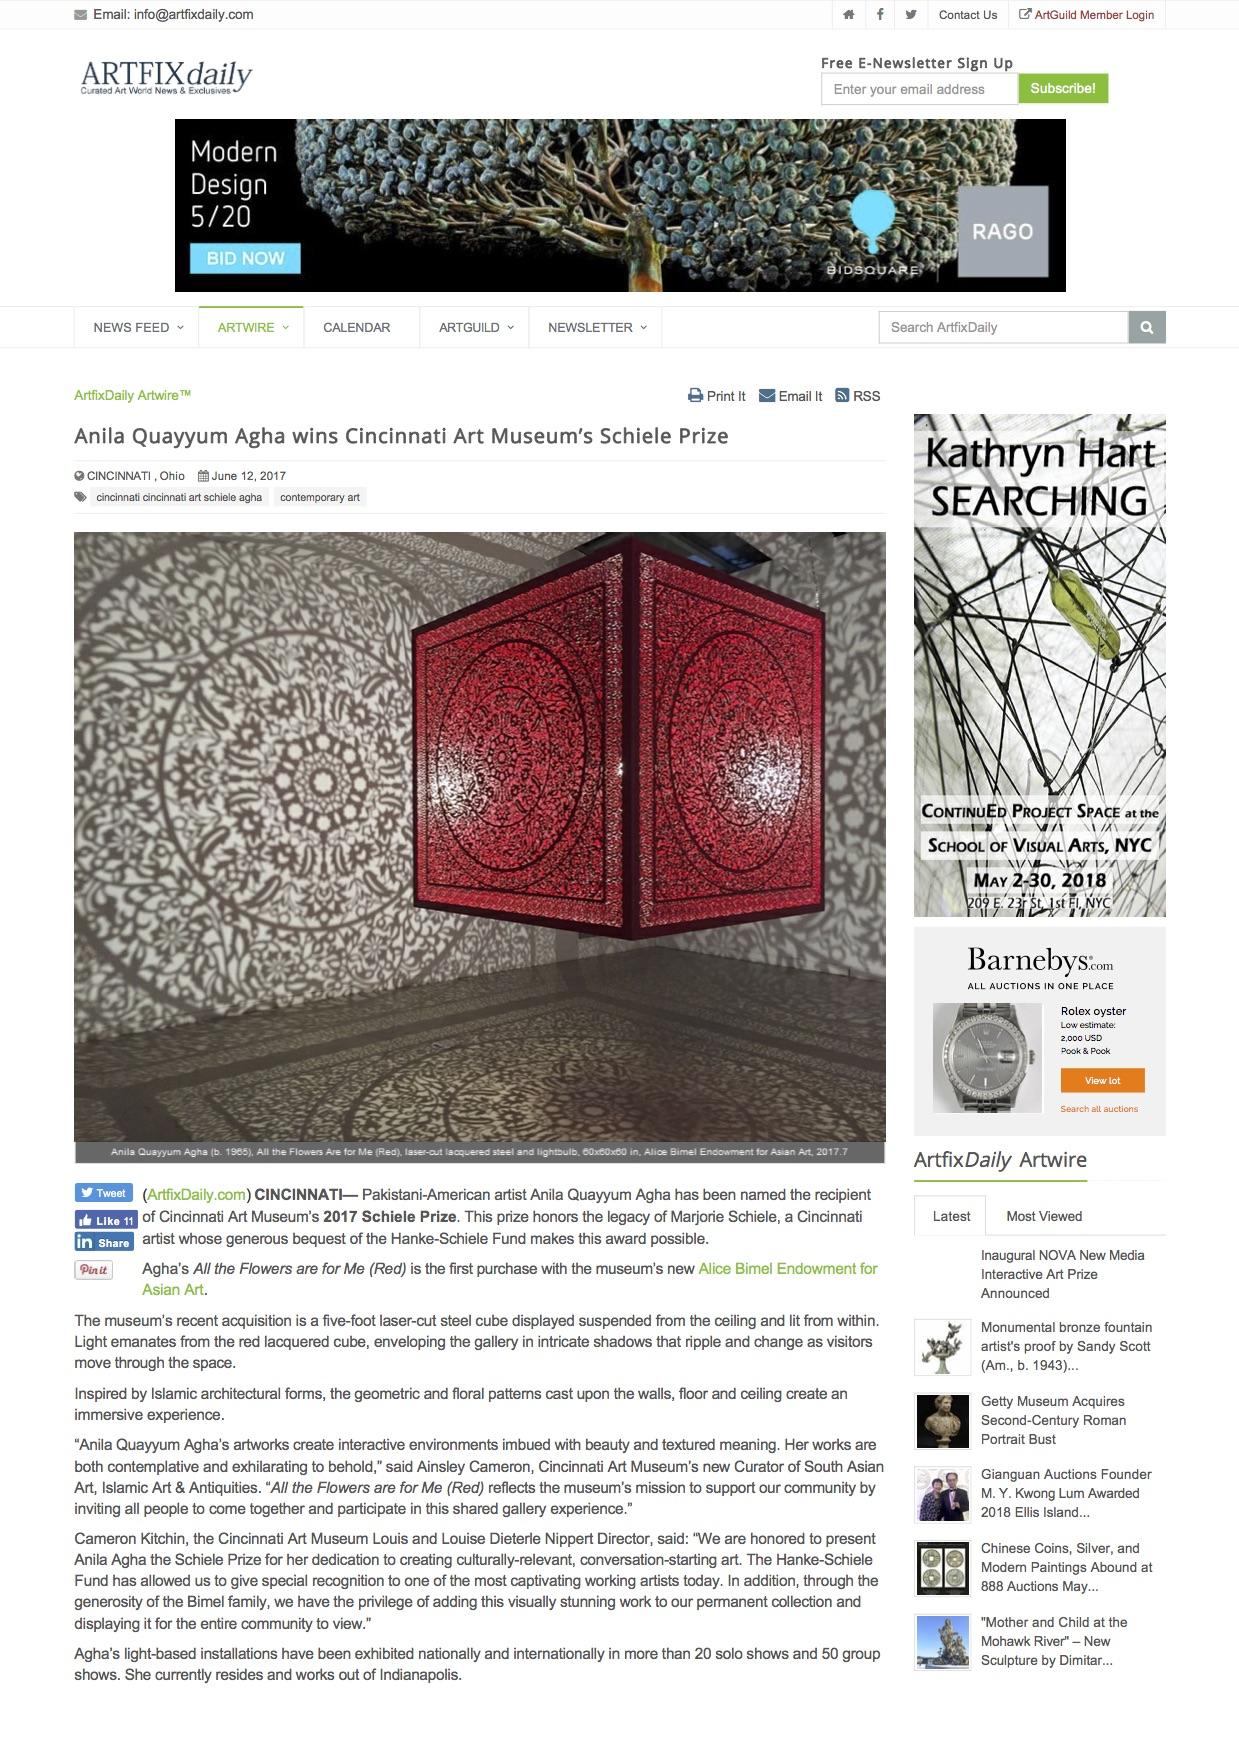 anila quayyum agha wins cincinnati art museum's schiele prize - artwire press release from artfixdaily.com.jpg